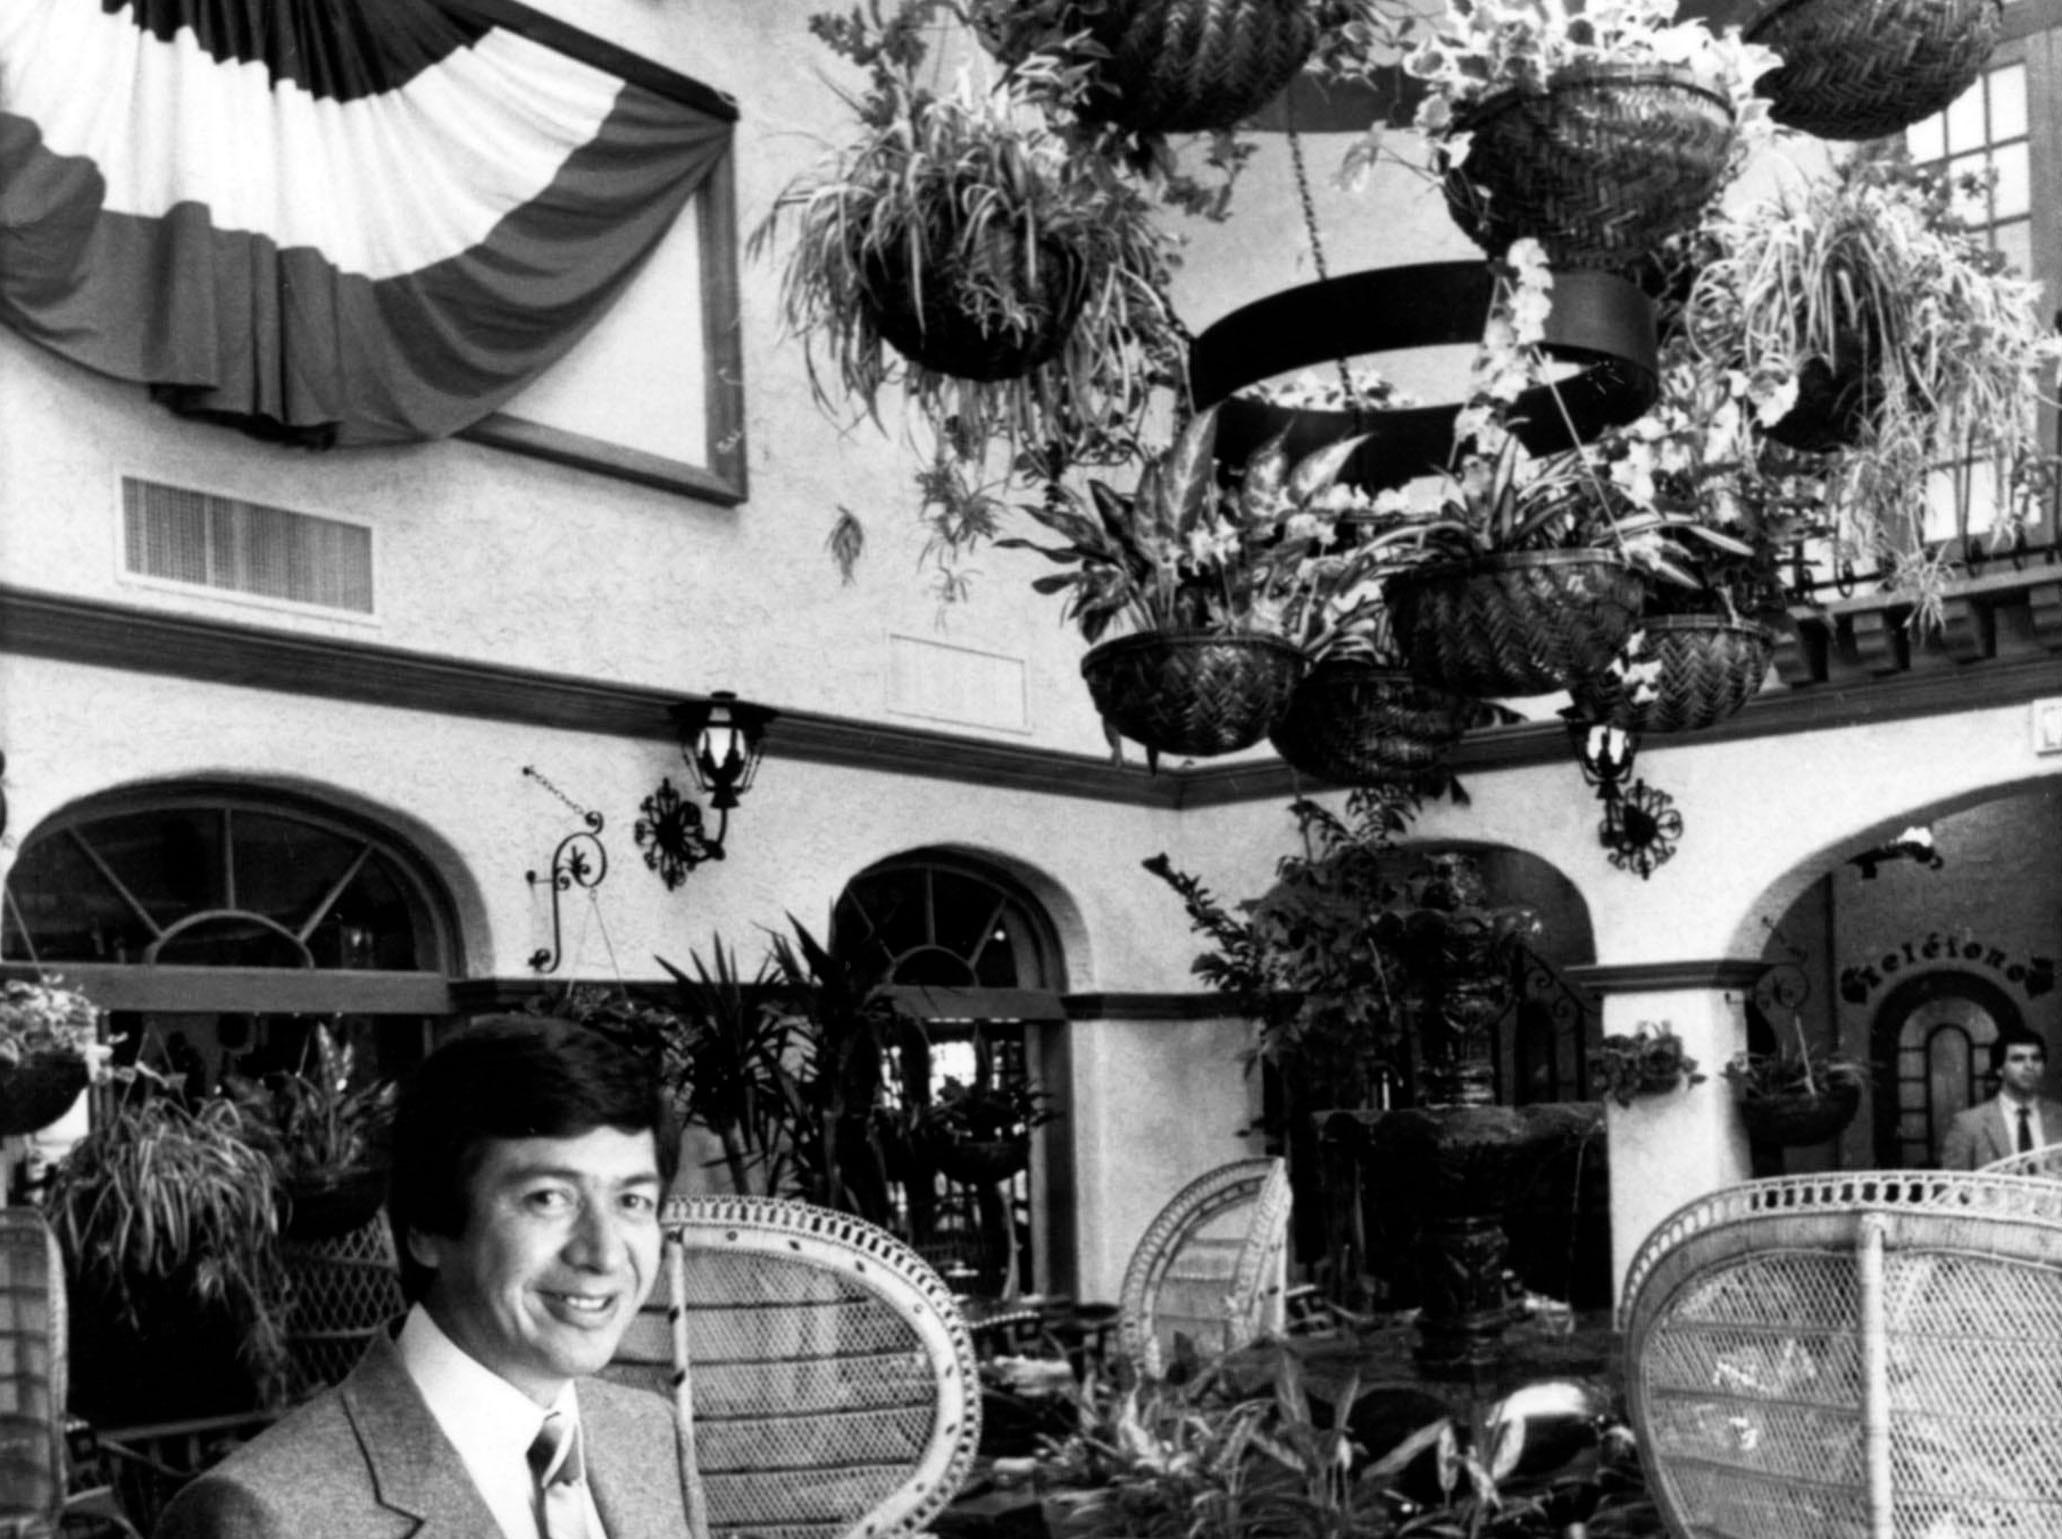 Ramon Gallardo of Casa Gallardo on Bearden Hill in 1981.